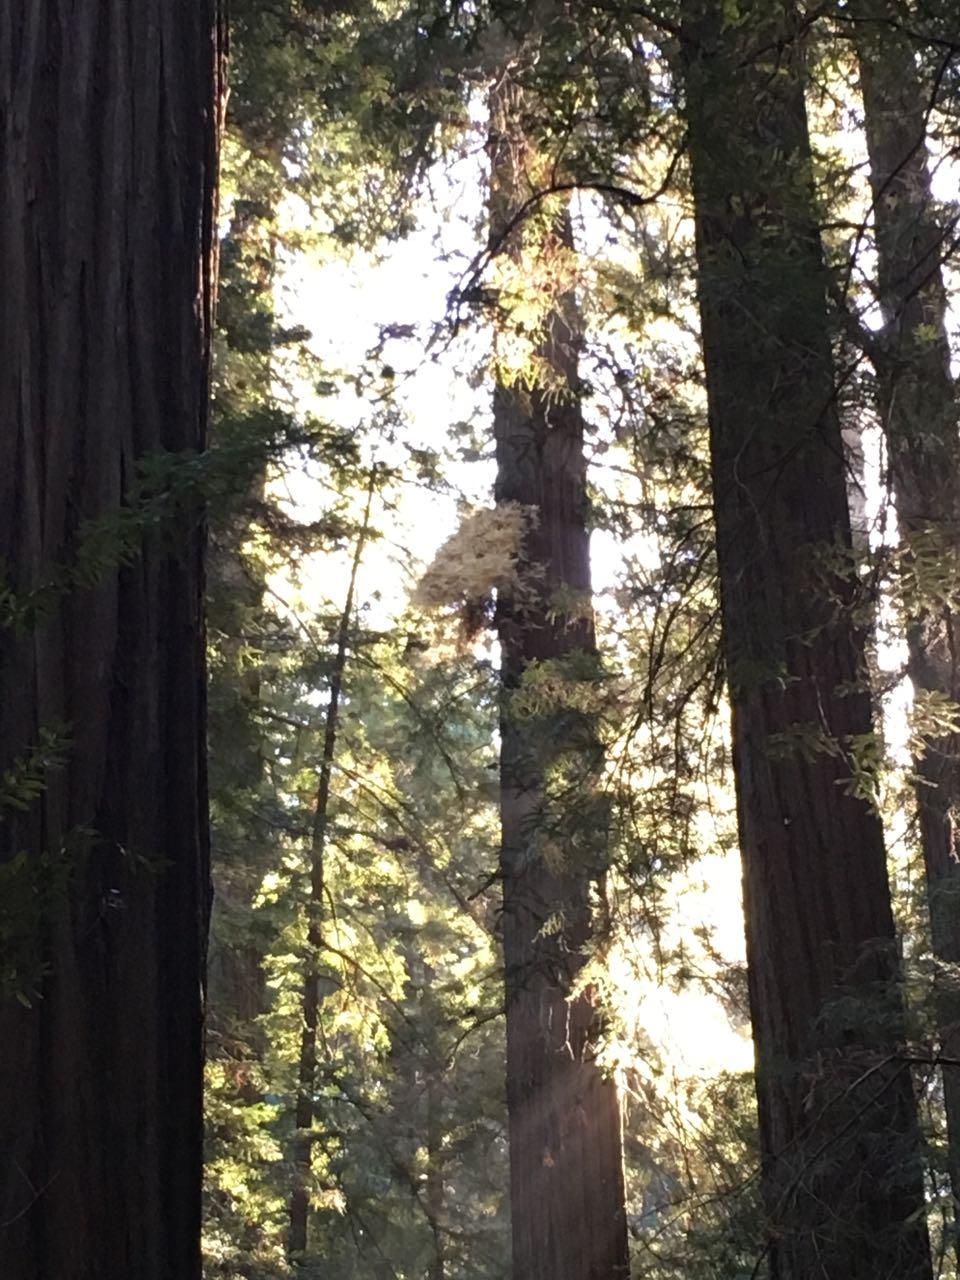 Redwoods 2017 10 08 17 Of 287